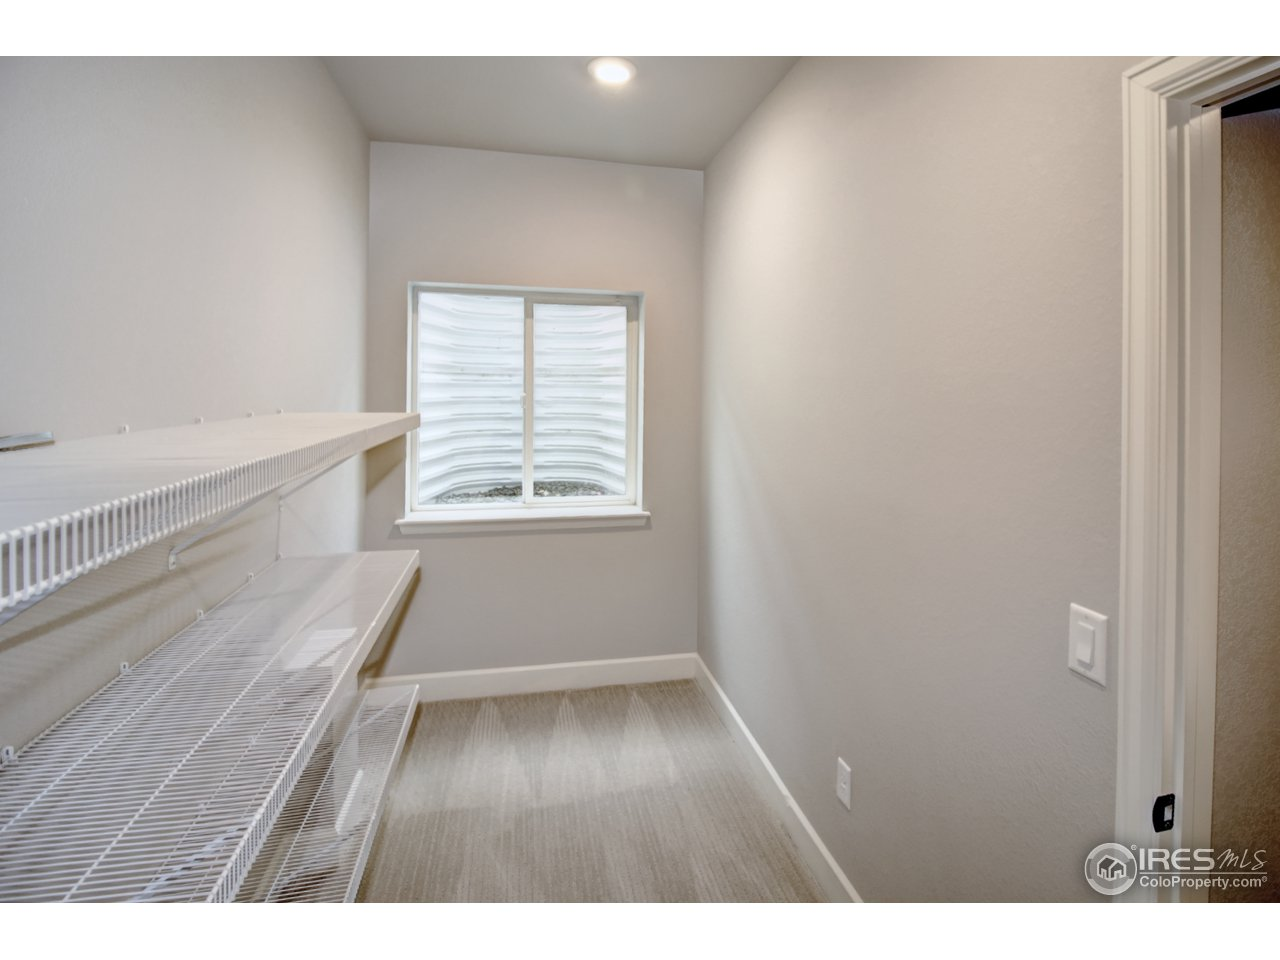 Large basement closet